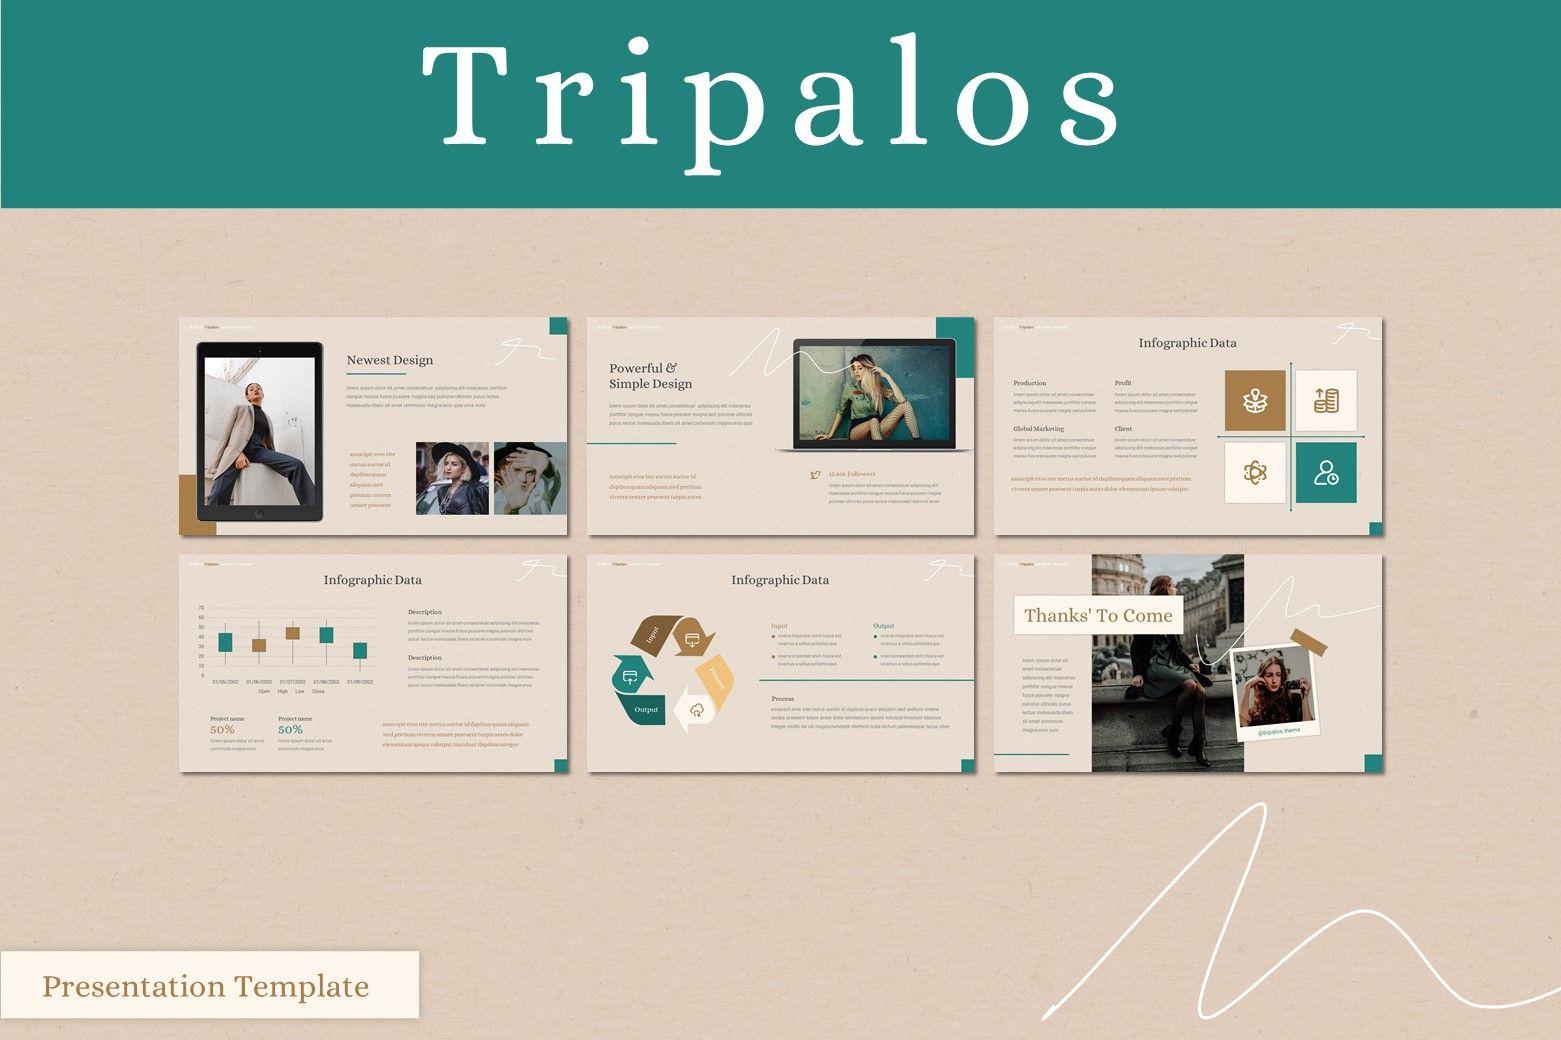 Tripalos - Keynote Template, Slide 4, 08038, Presentation Templates — PoweredTemplate.com